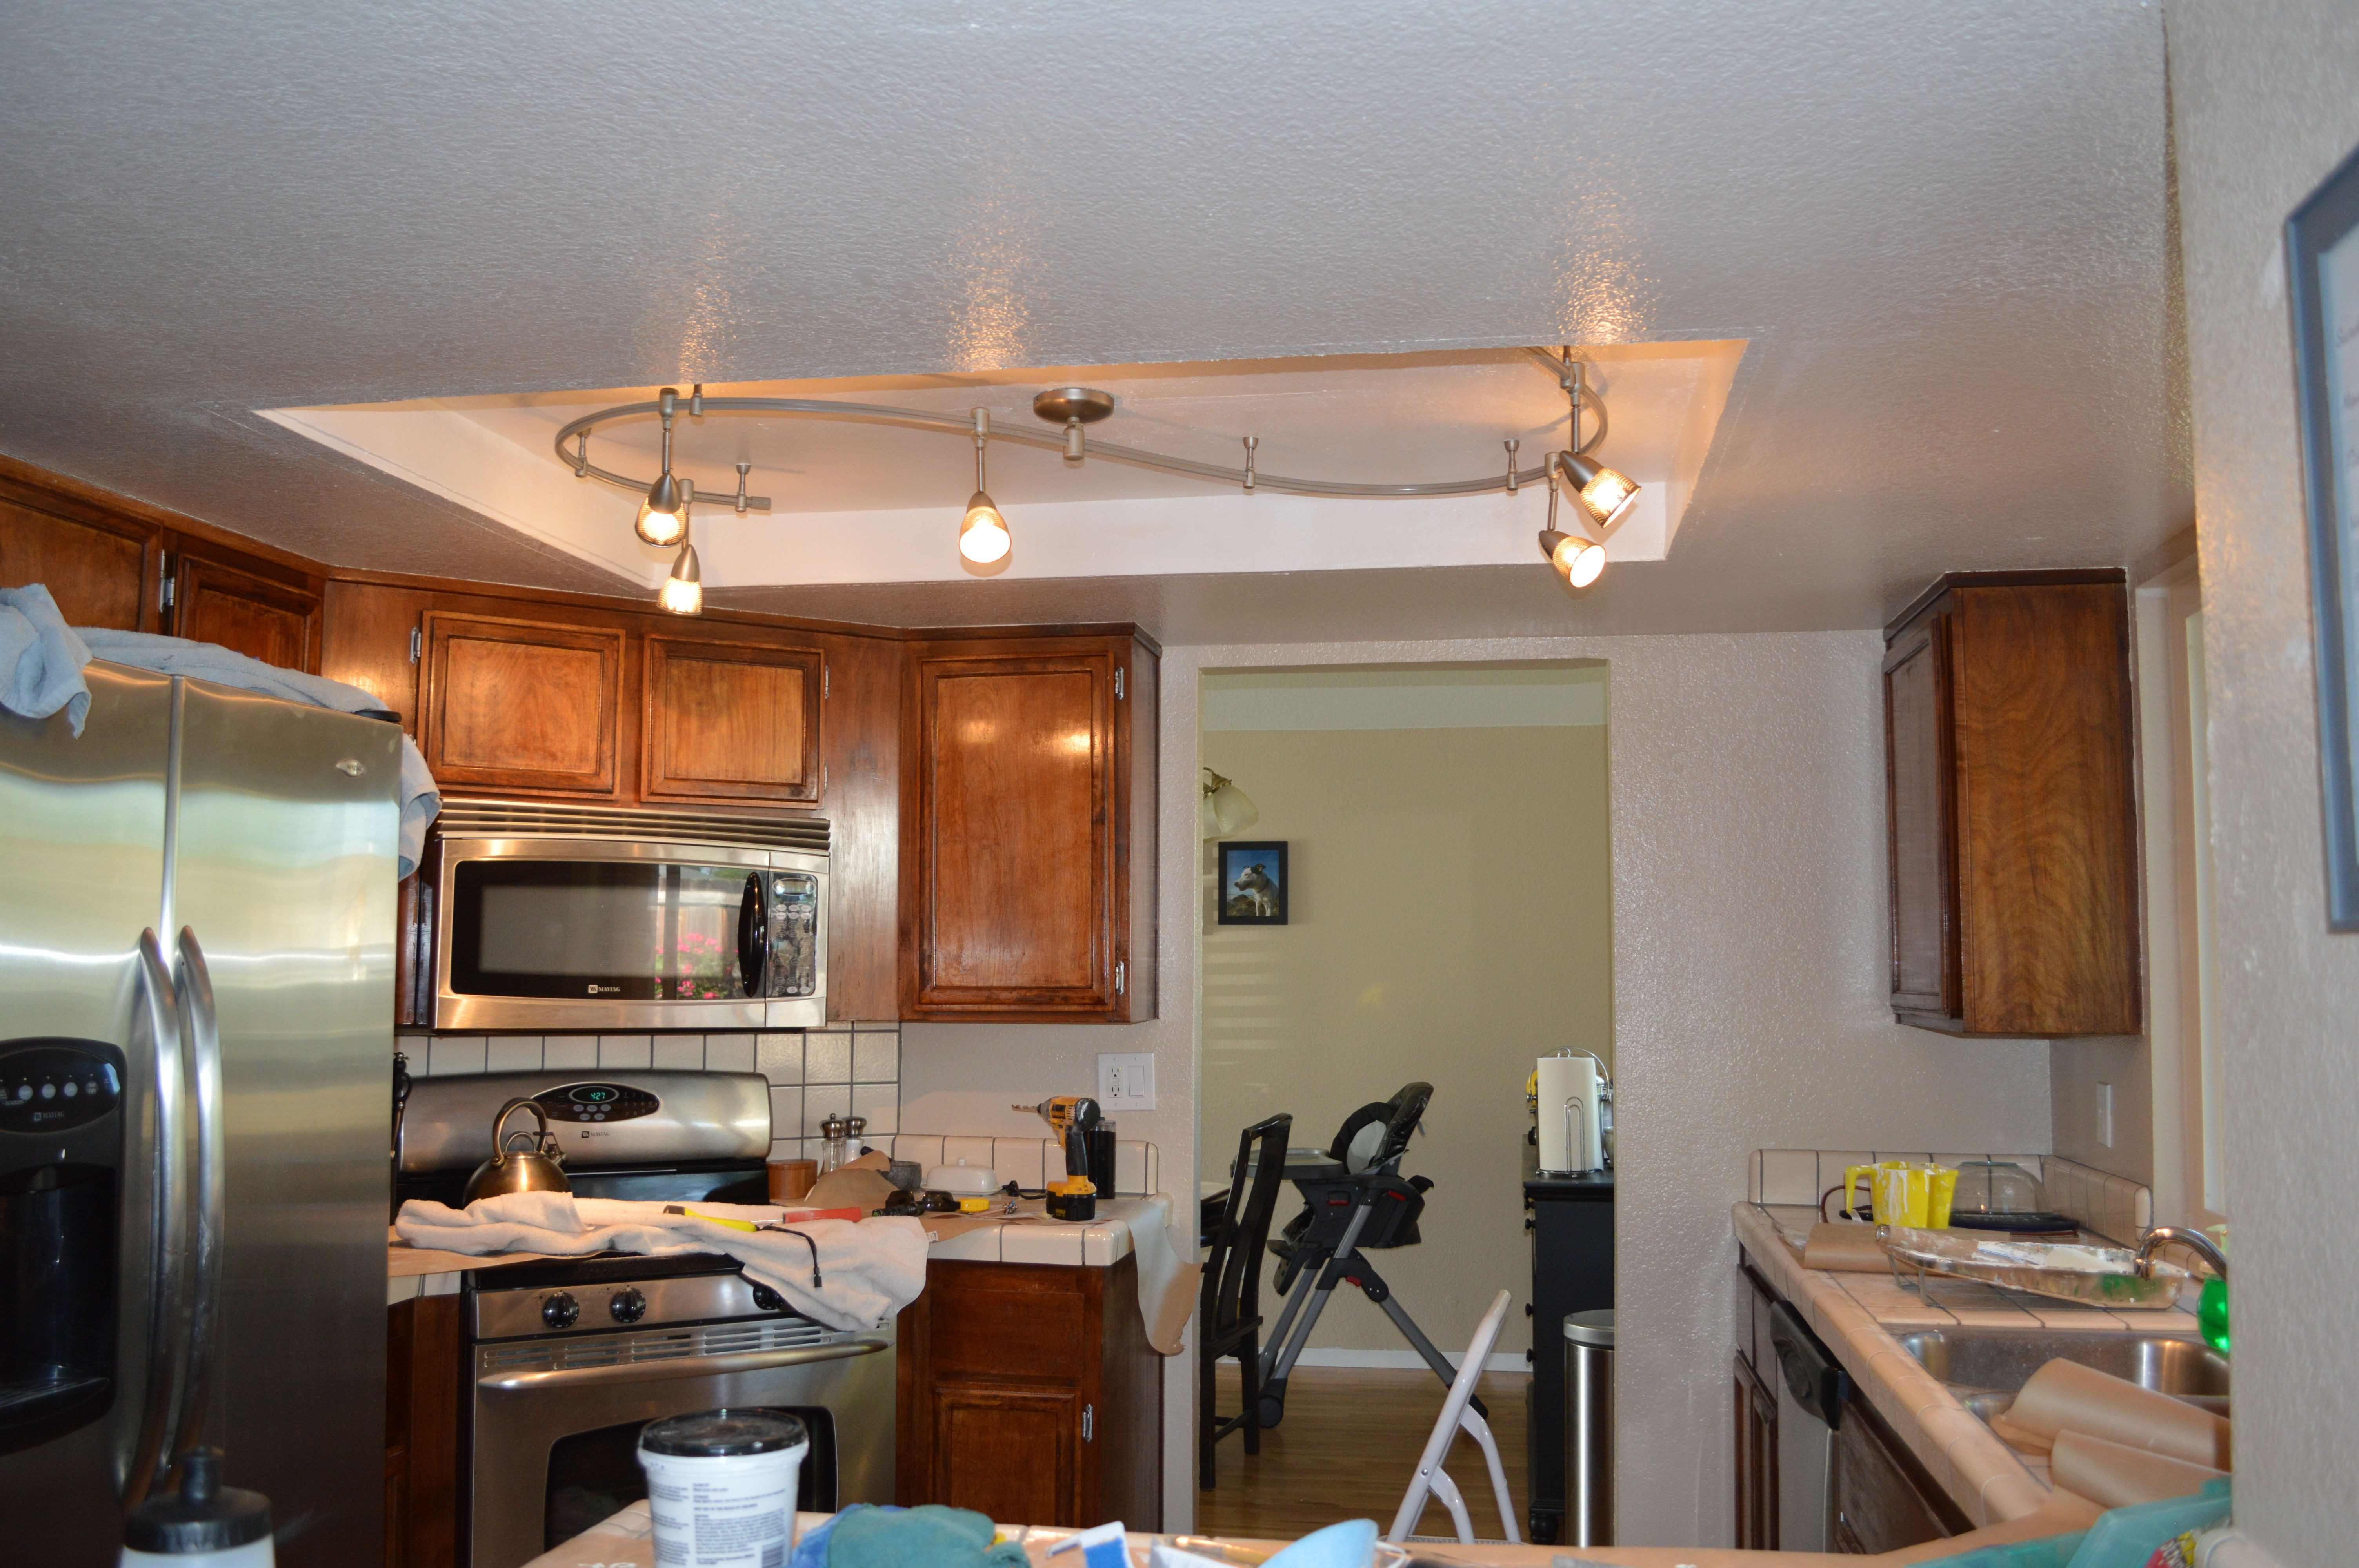 Replacing Fluorescent Light Fixtures